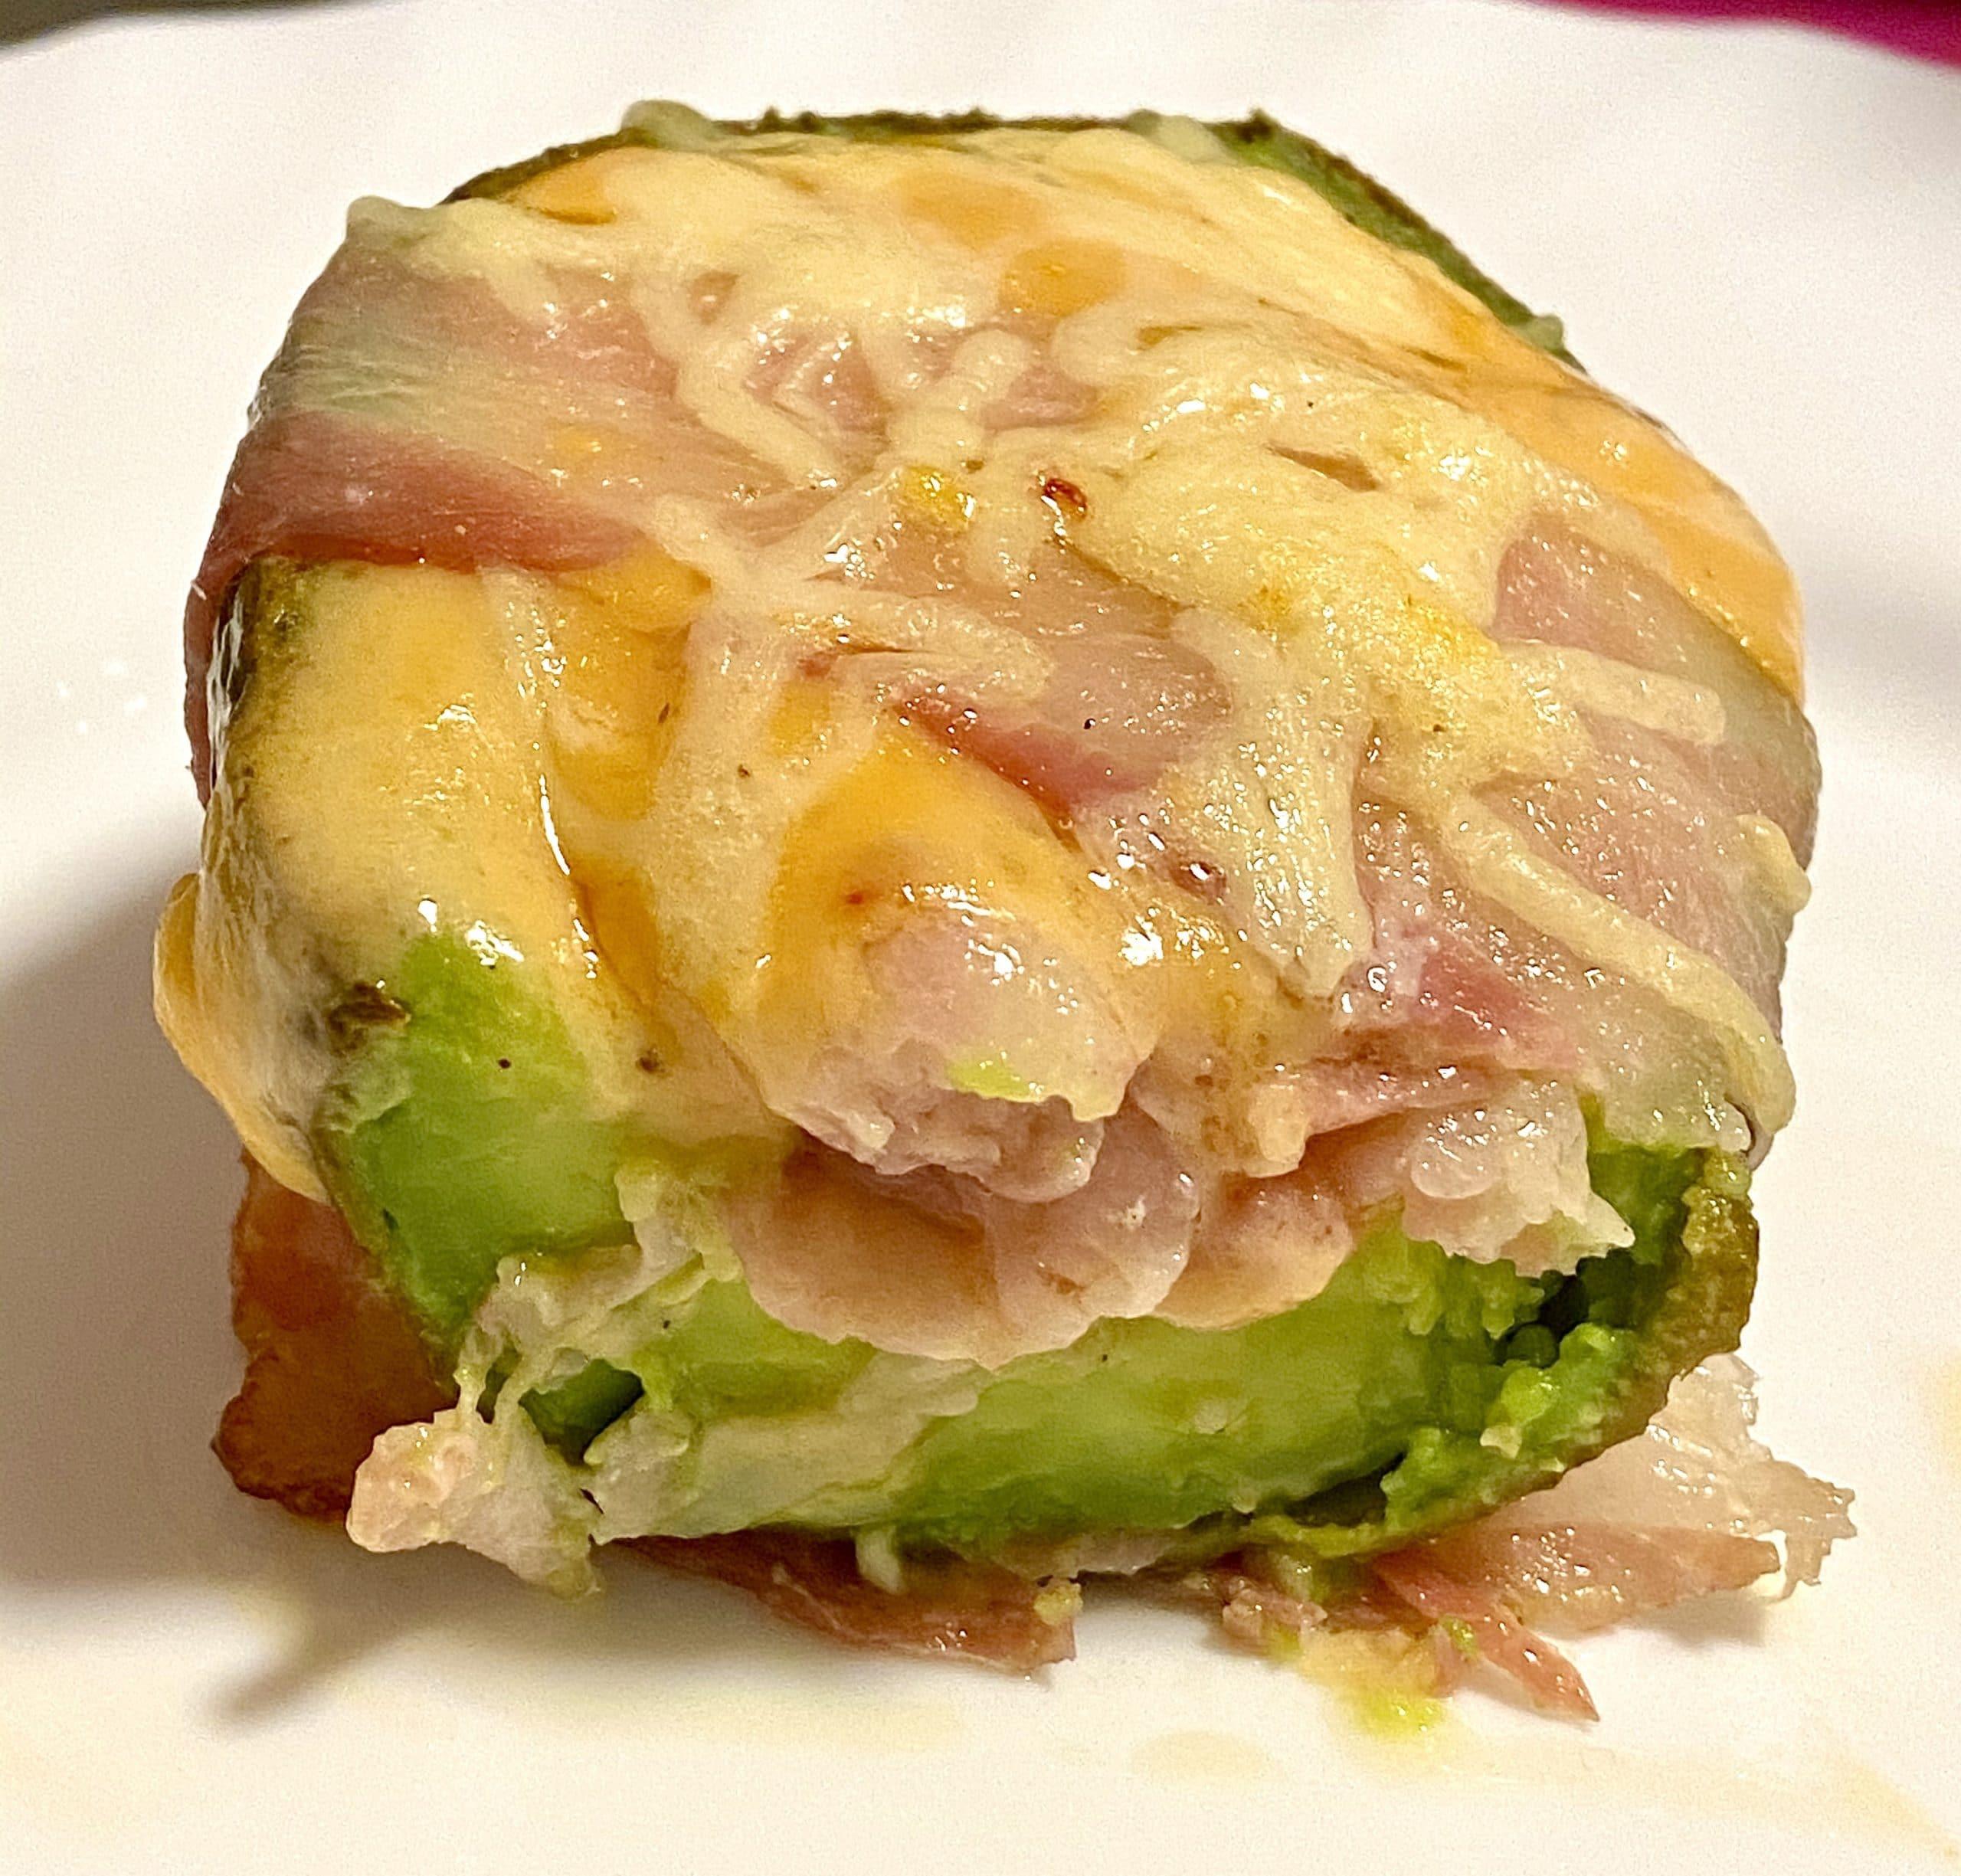 Überbackene Avocados